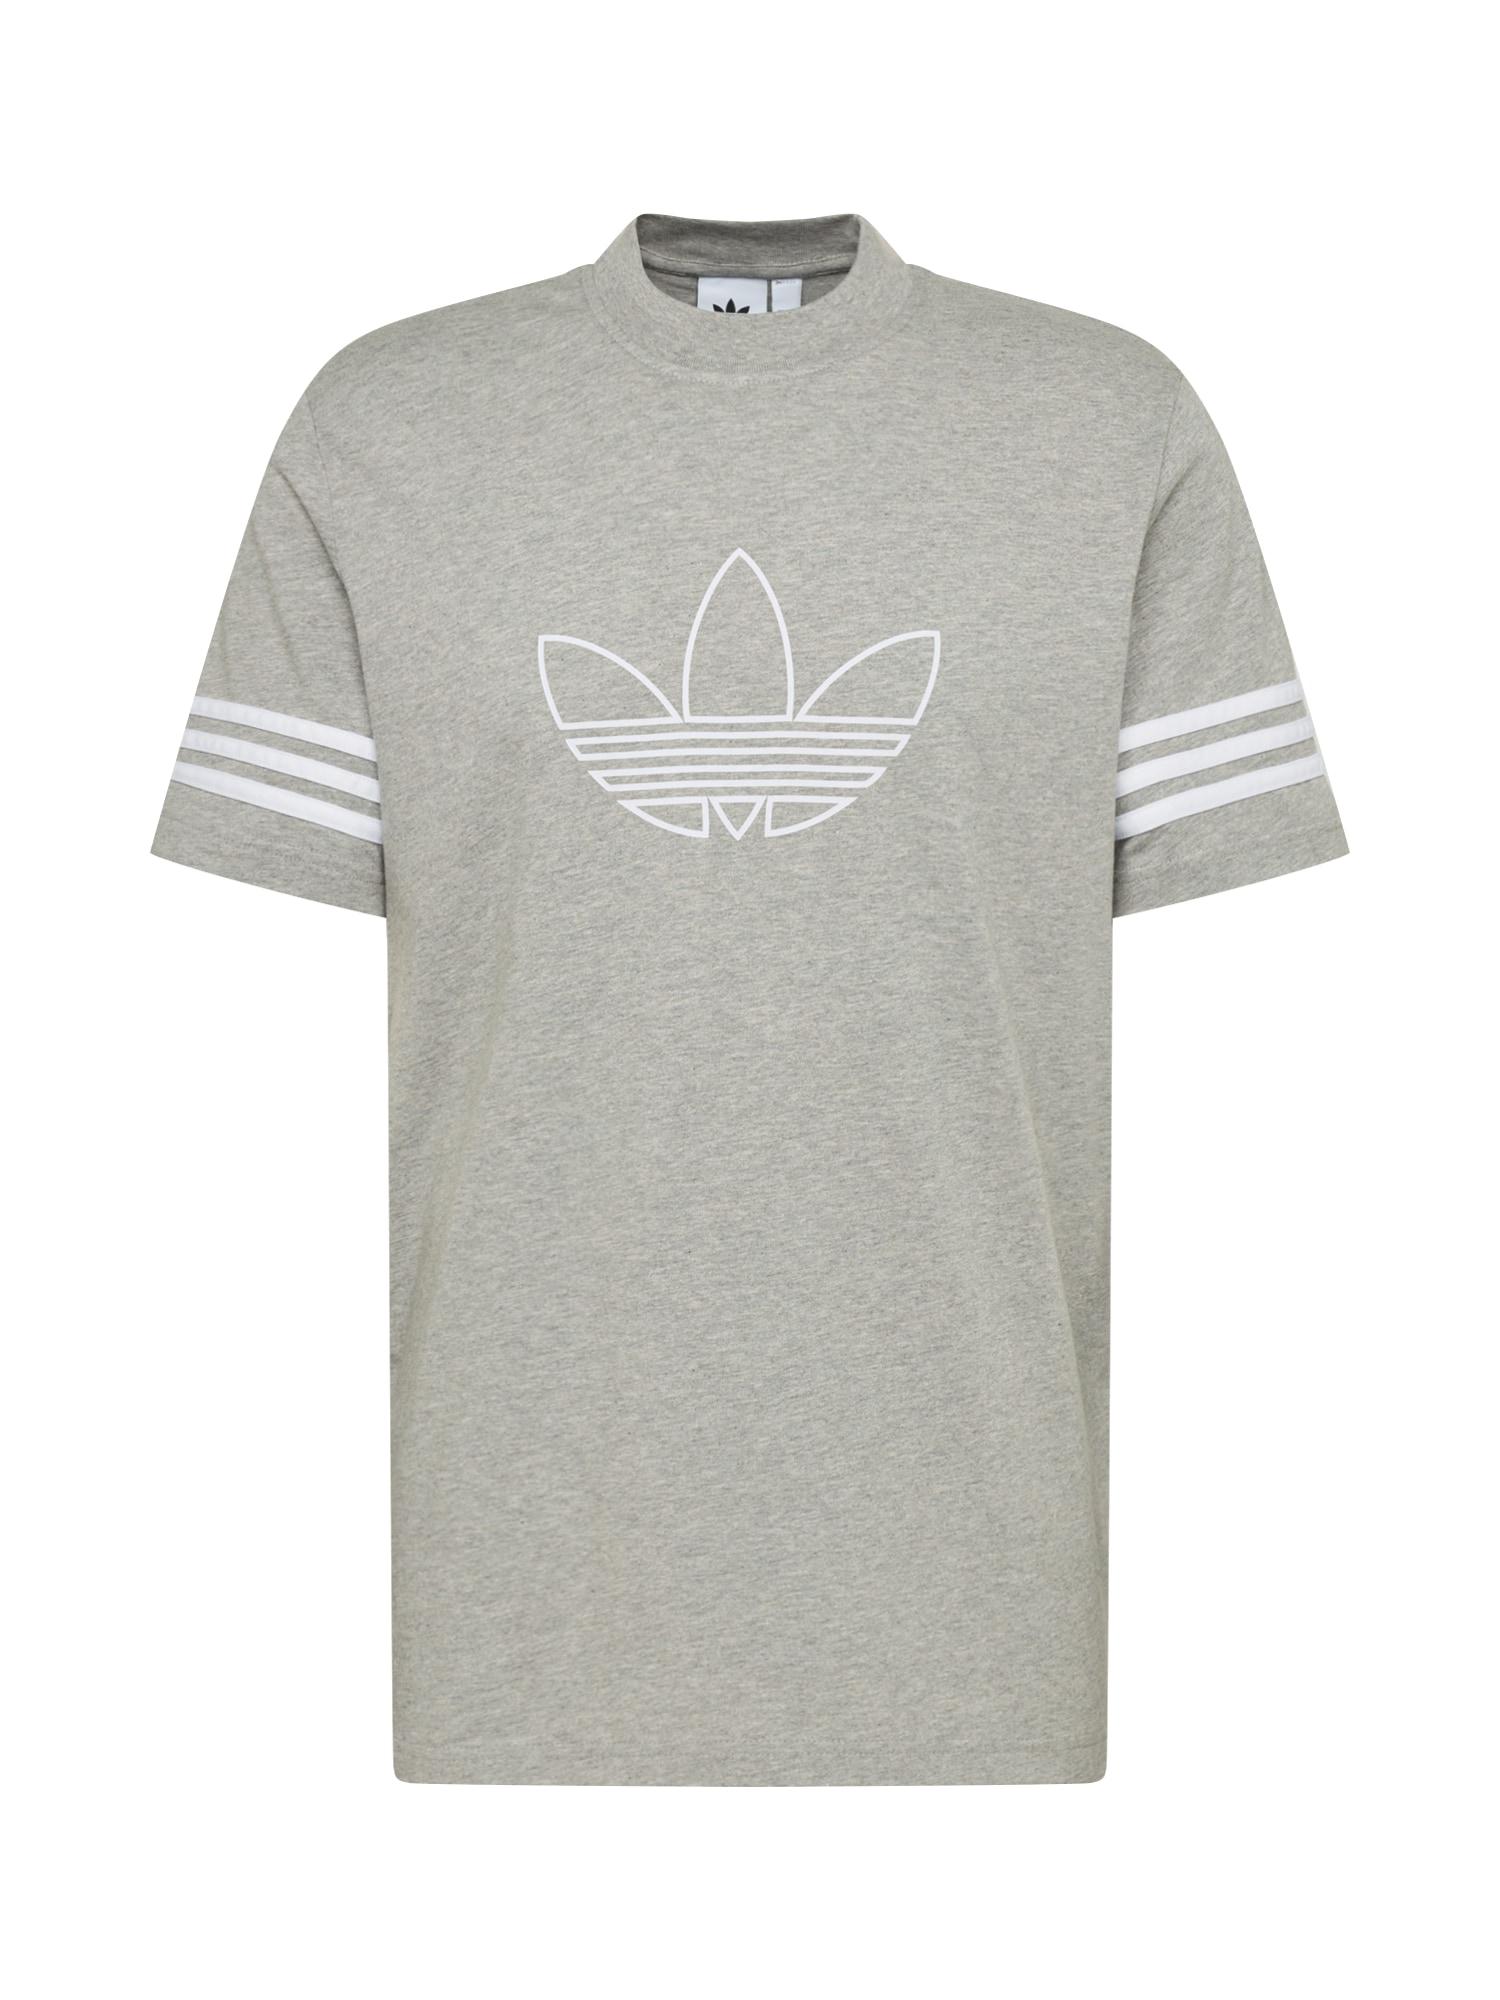 ADIDAS ORIGINALS Marškinėliai 'OUTLINE TEE' margai pilka / balta